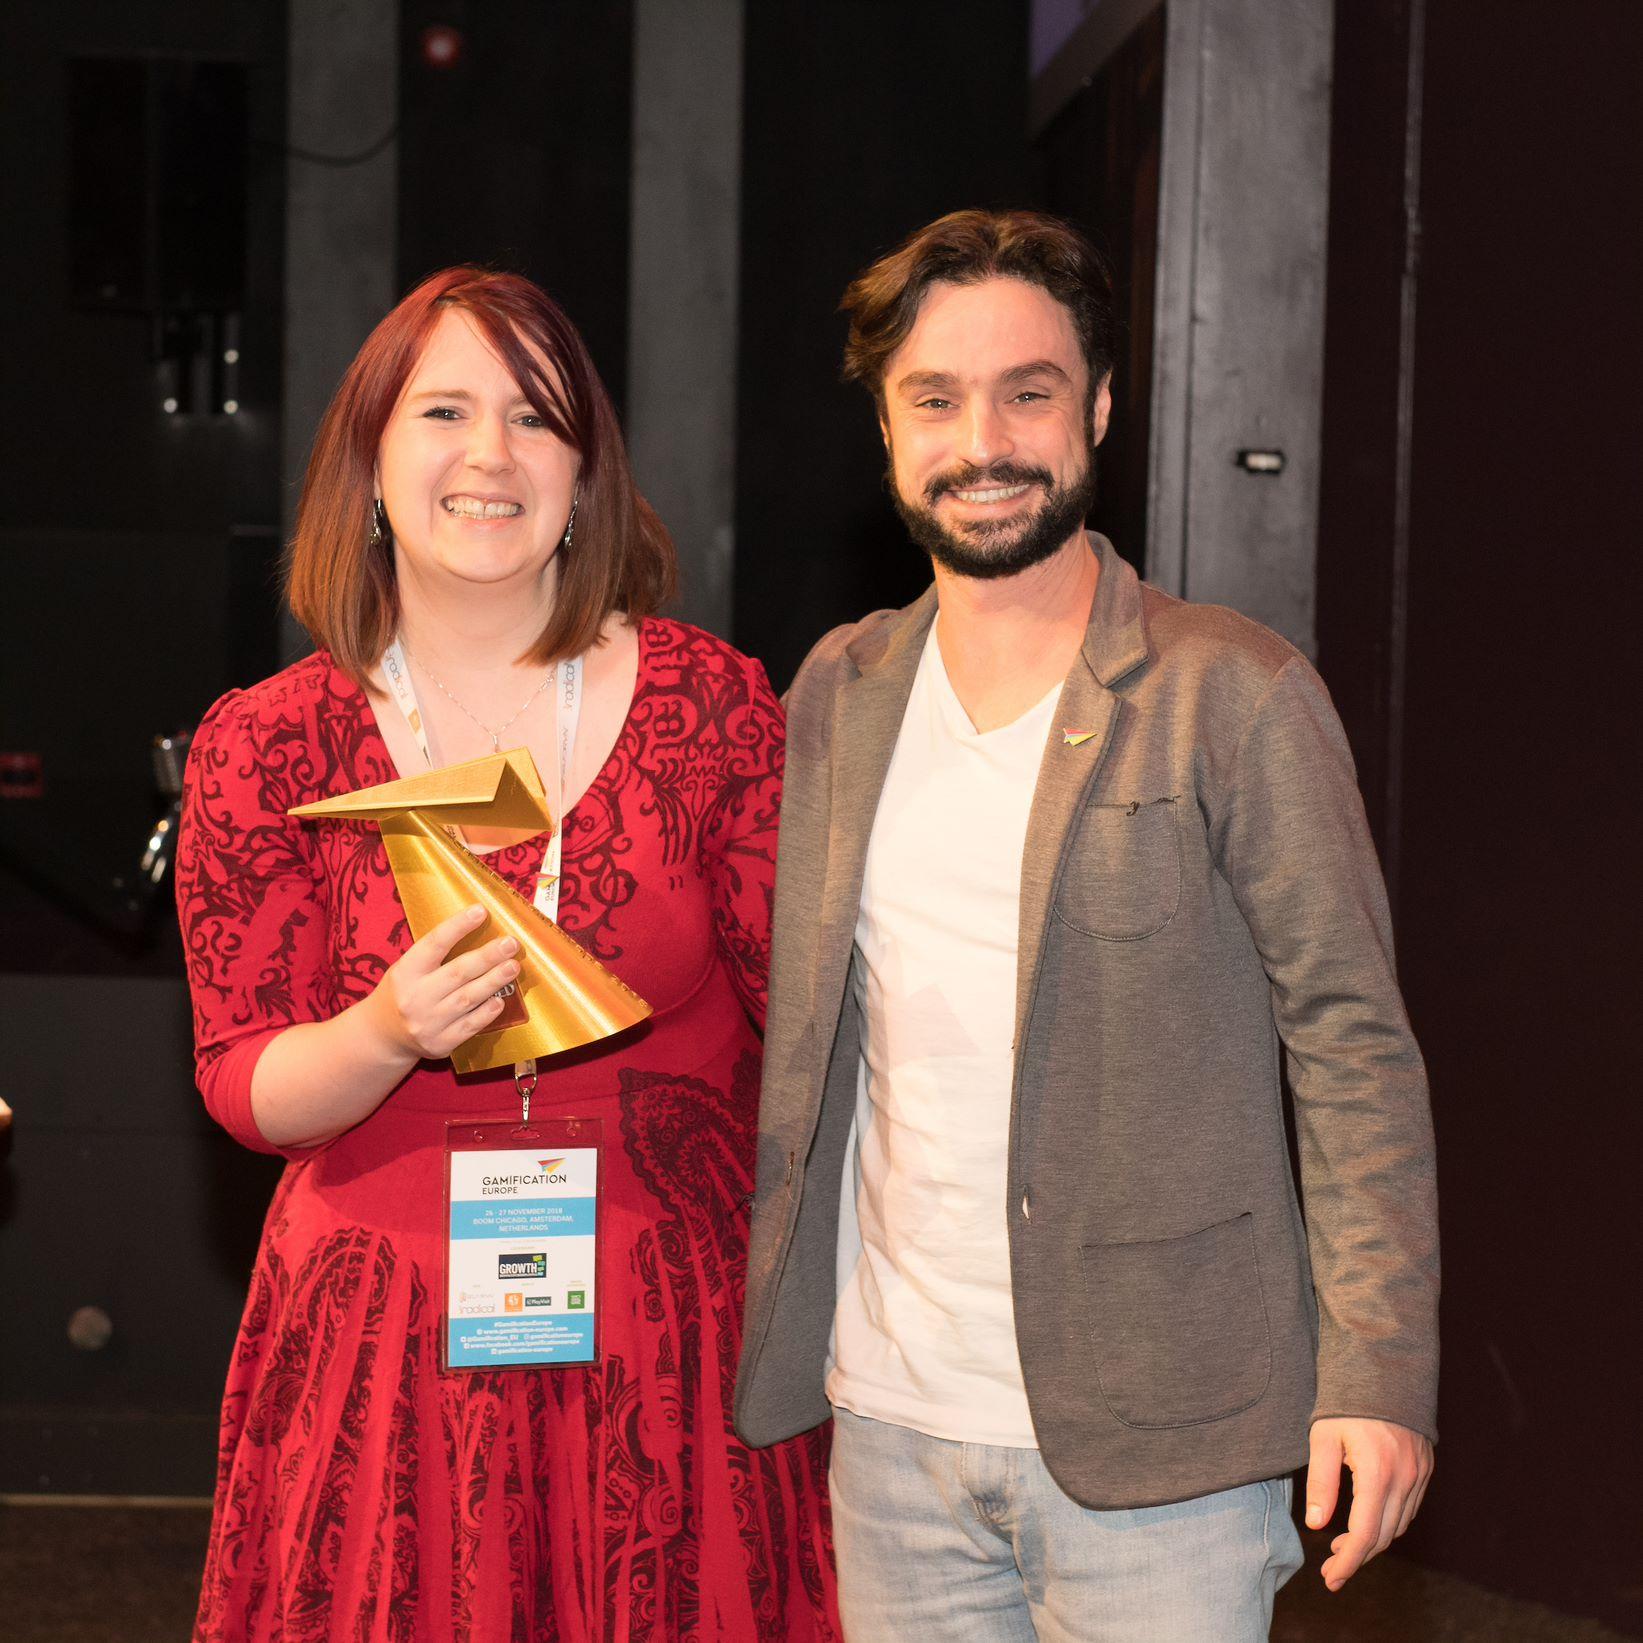 Pau Award 2018